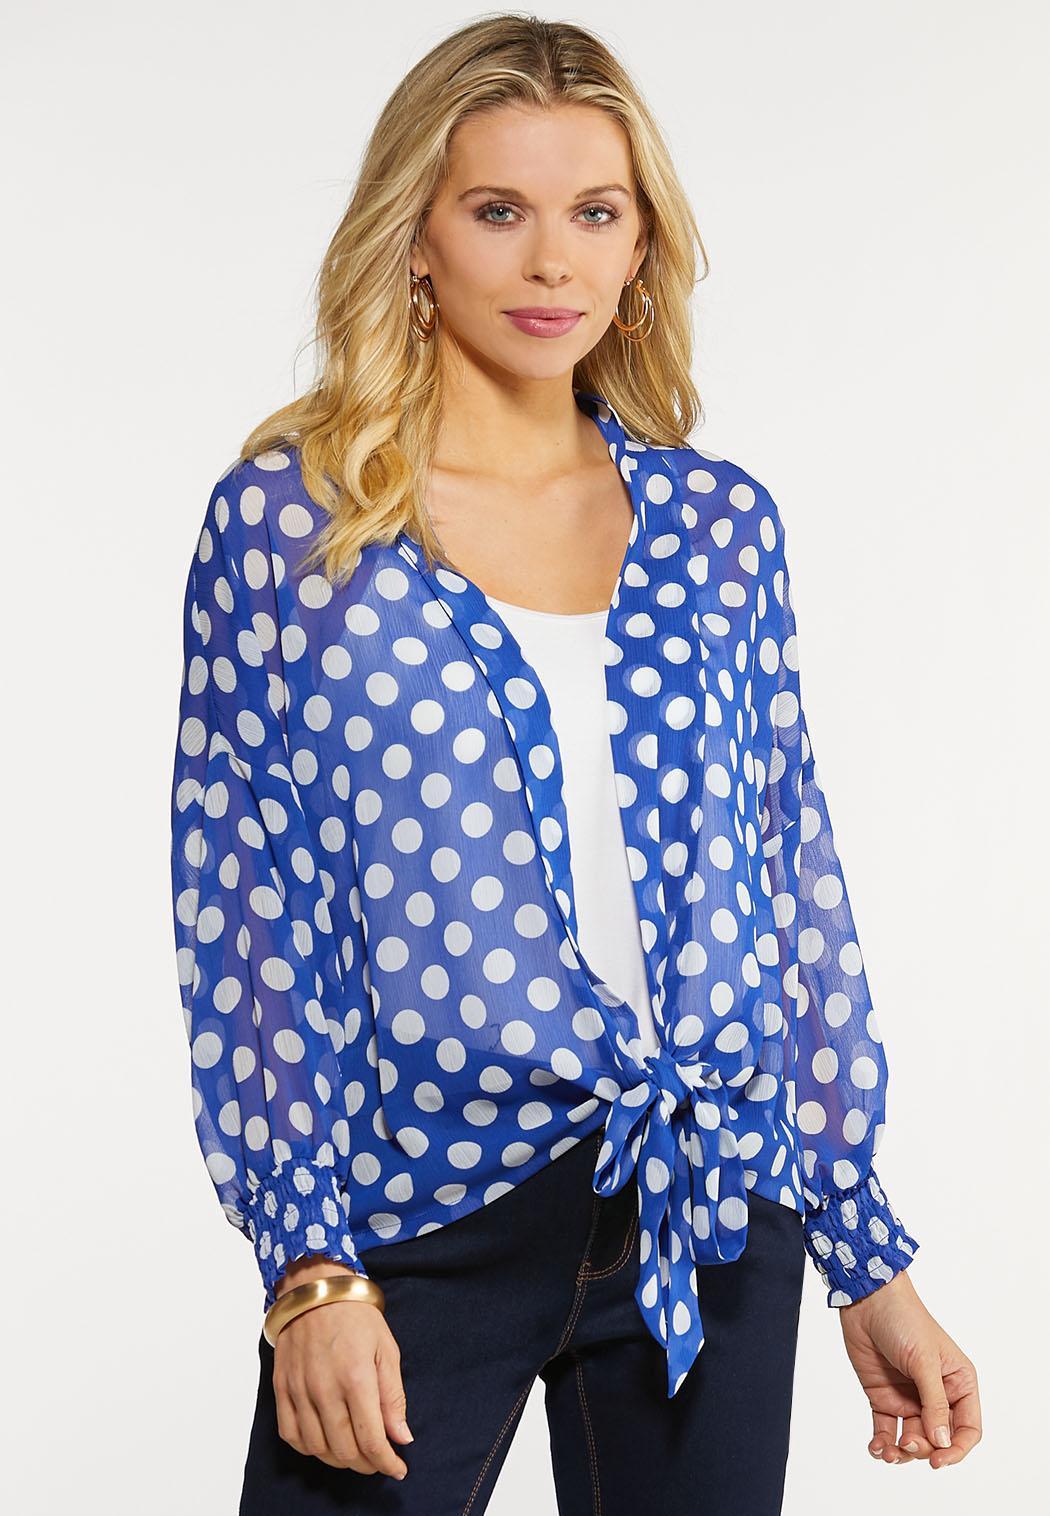 Polka Dot Kimono Top